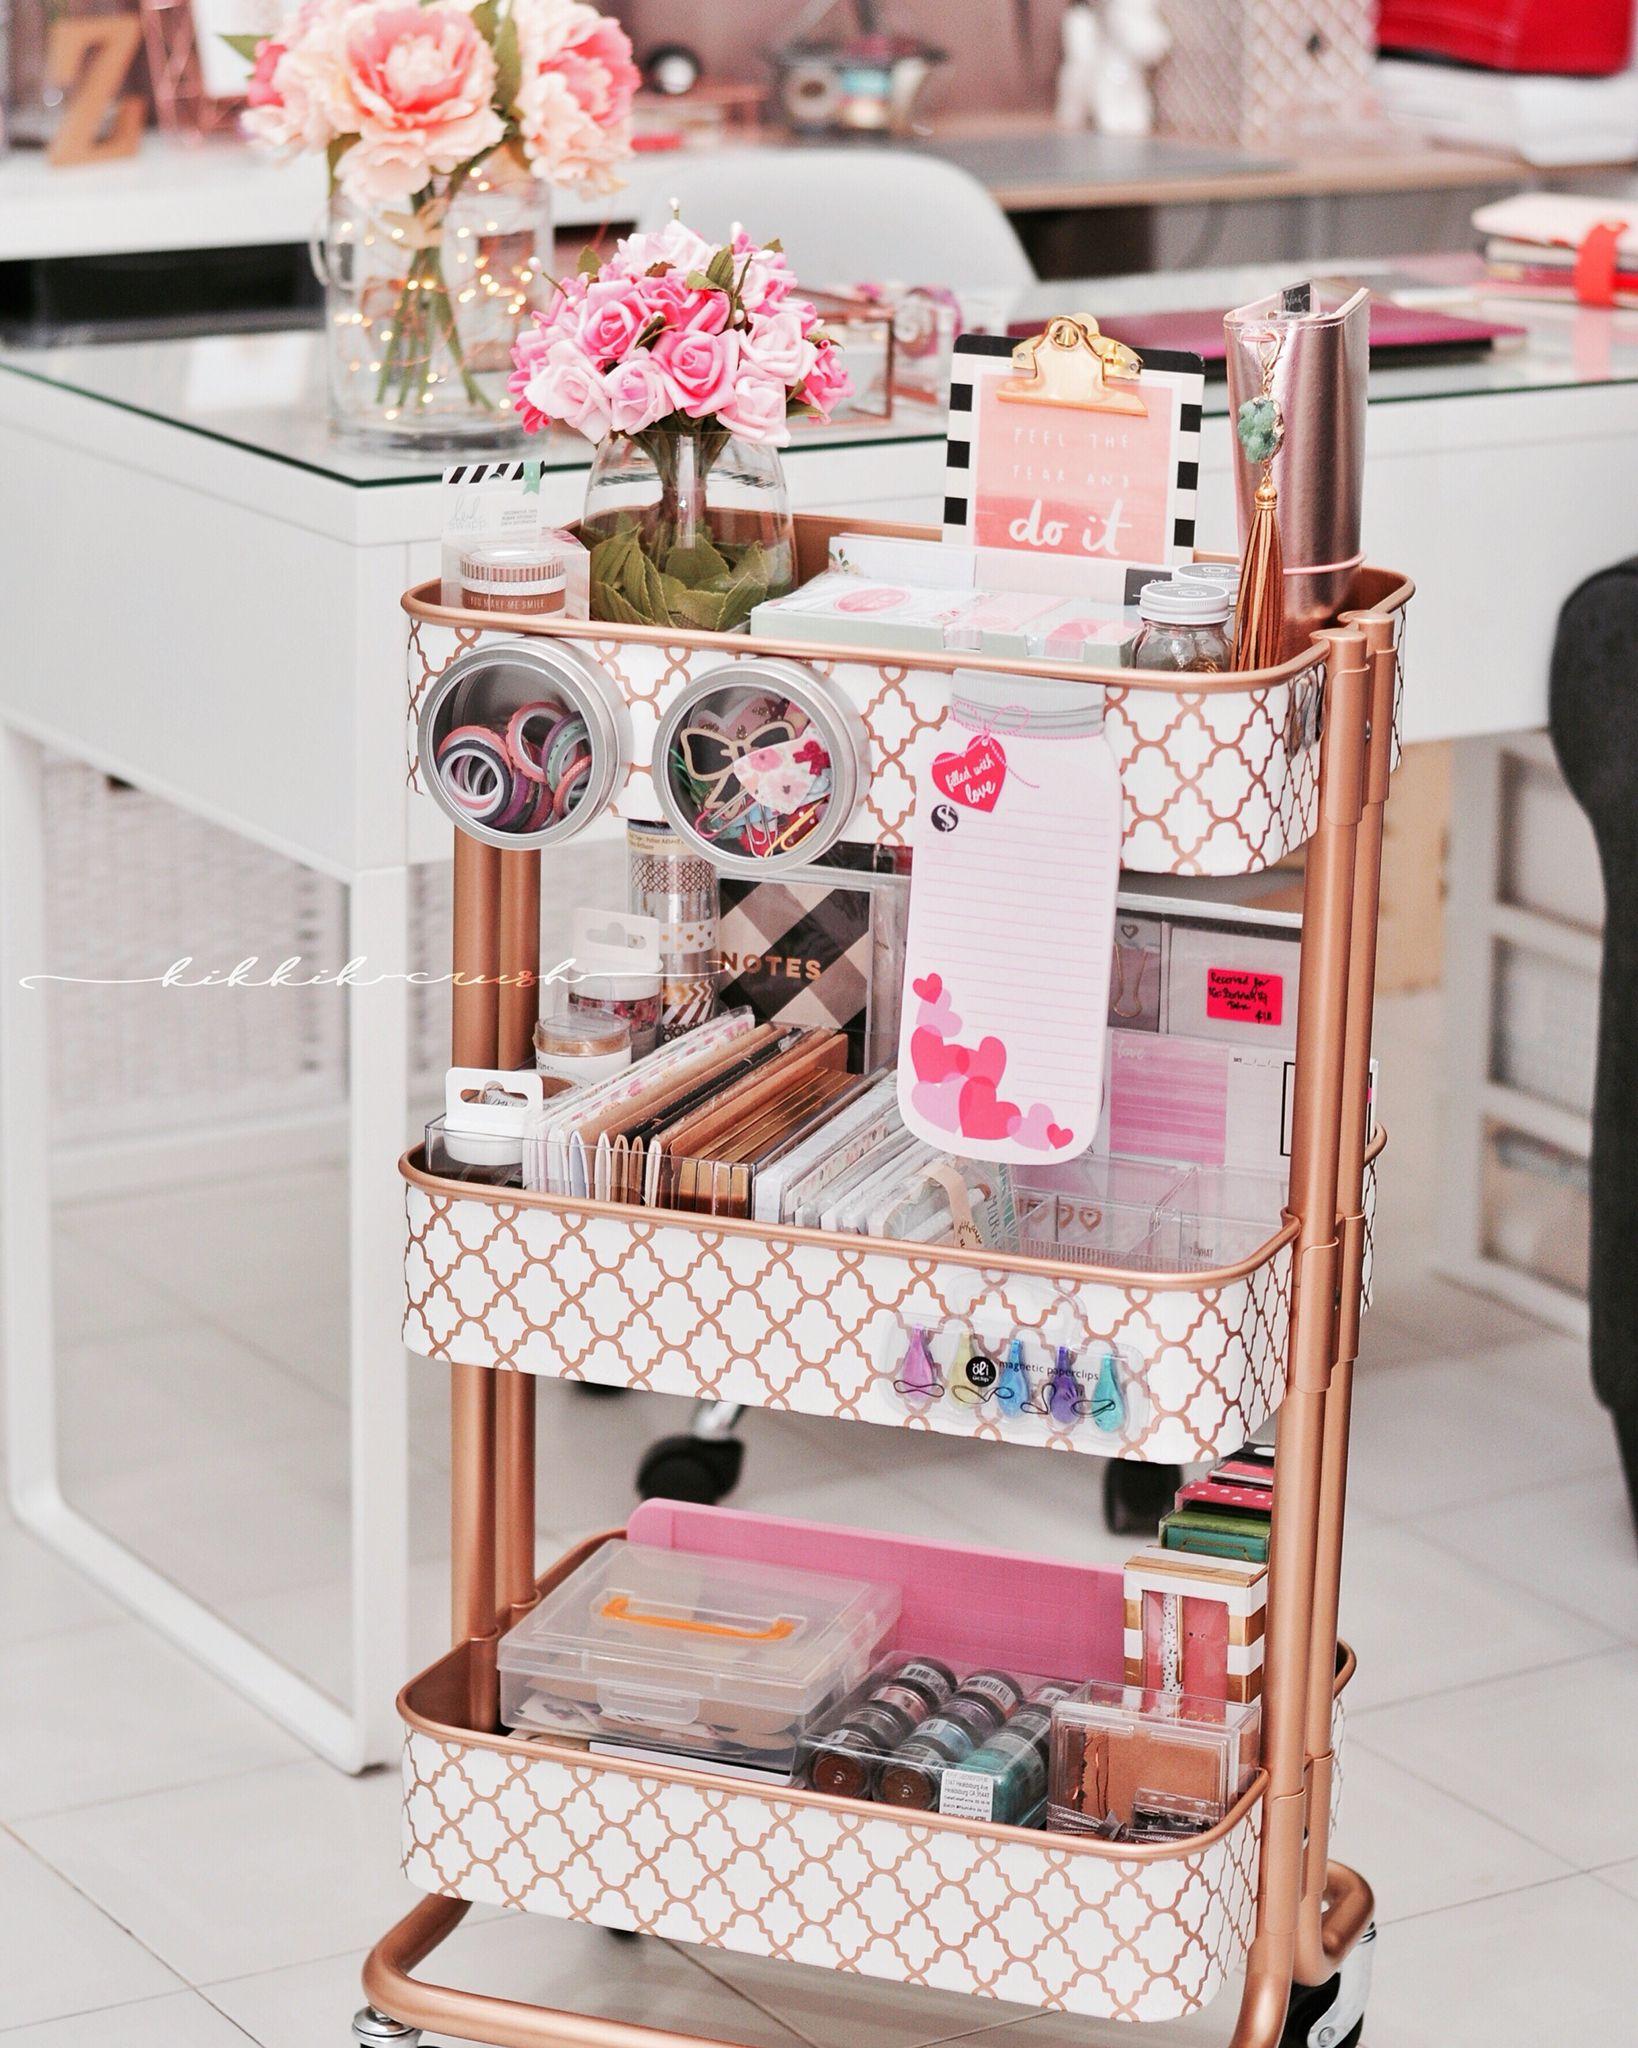 ikea raskog cart raskog pinterest rangement id es de rangement et amenagement maison. Black Bedroom Furniture Sets. Home Design Ideas